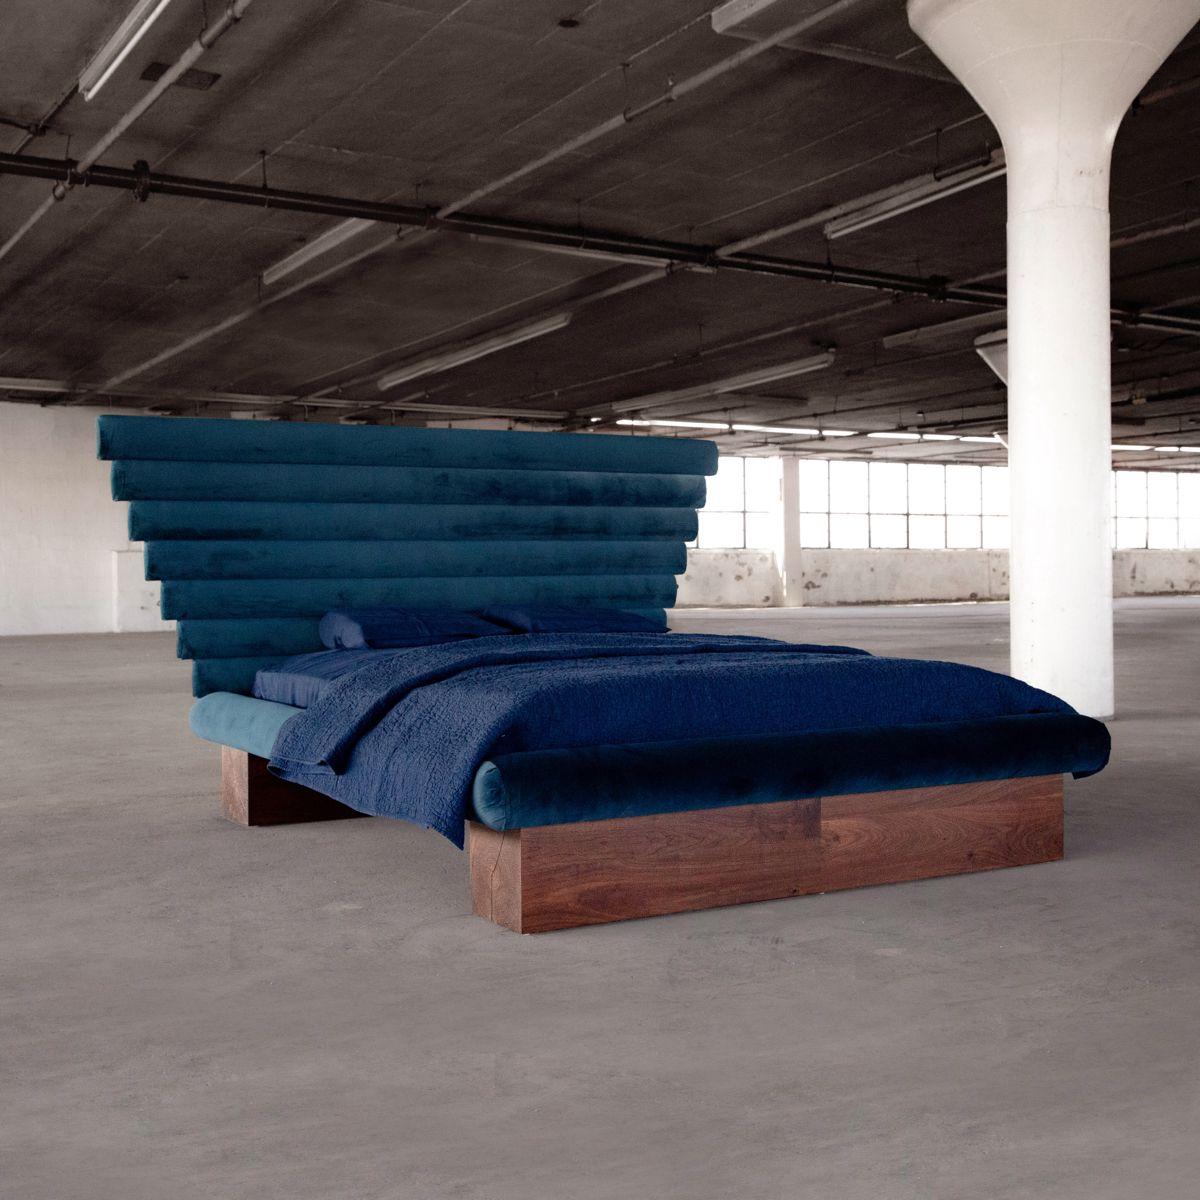 Solid Wood Luxury Platform Beds Brooklyn, NYC SENTIENT